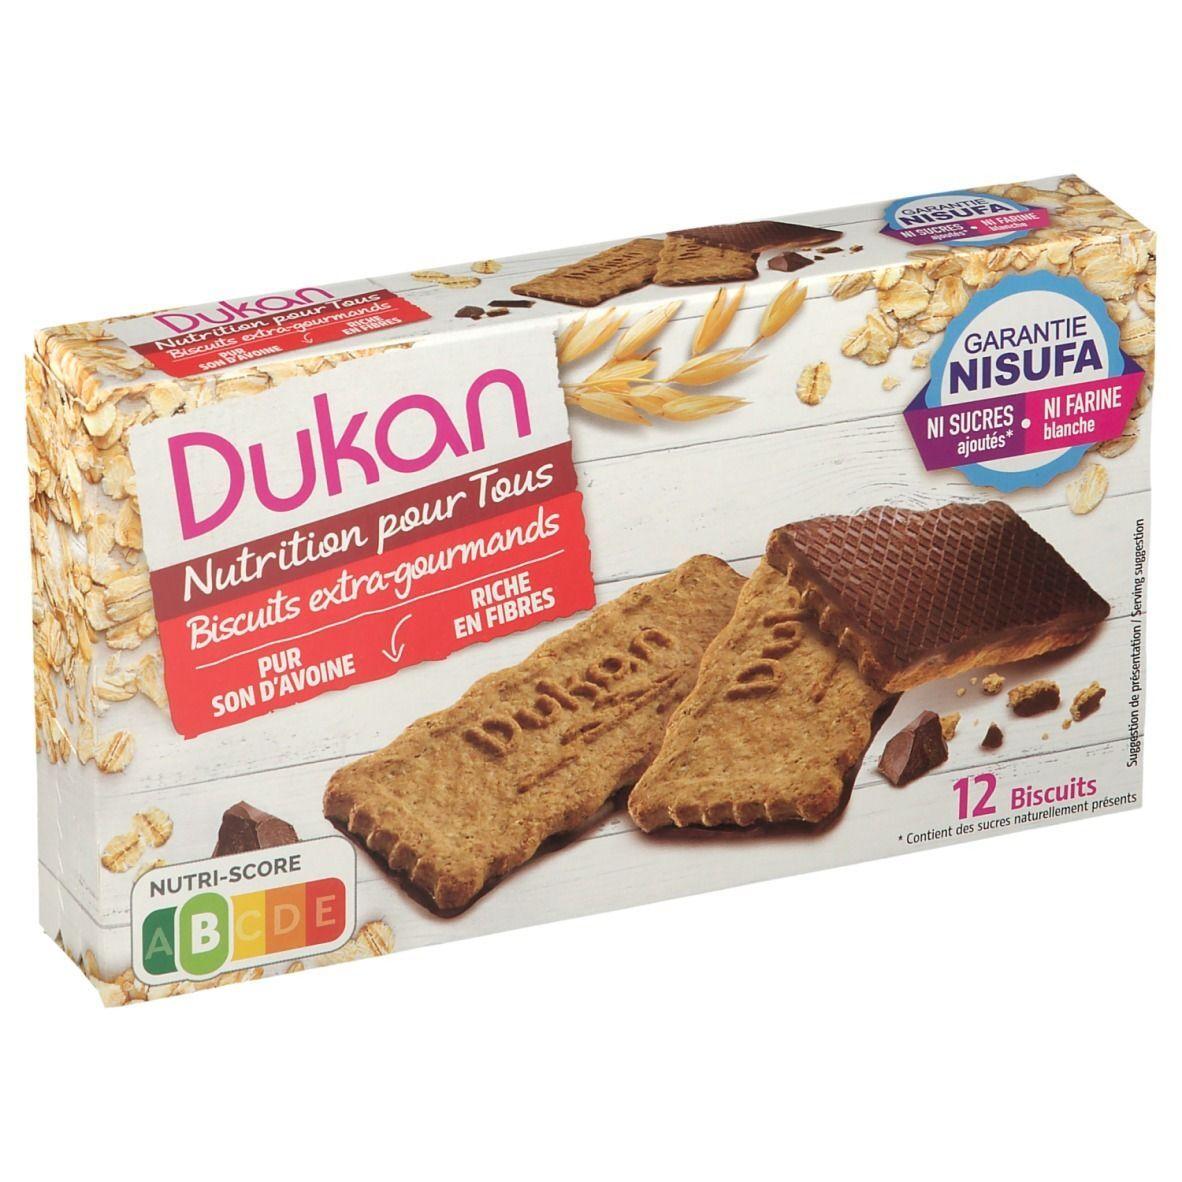 Dukan Biscuits de son d'avoine nappés de chocolat g Cookies